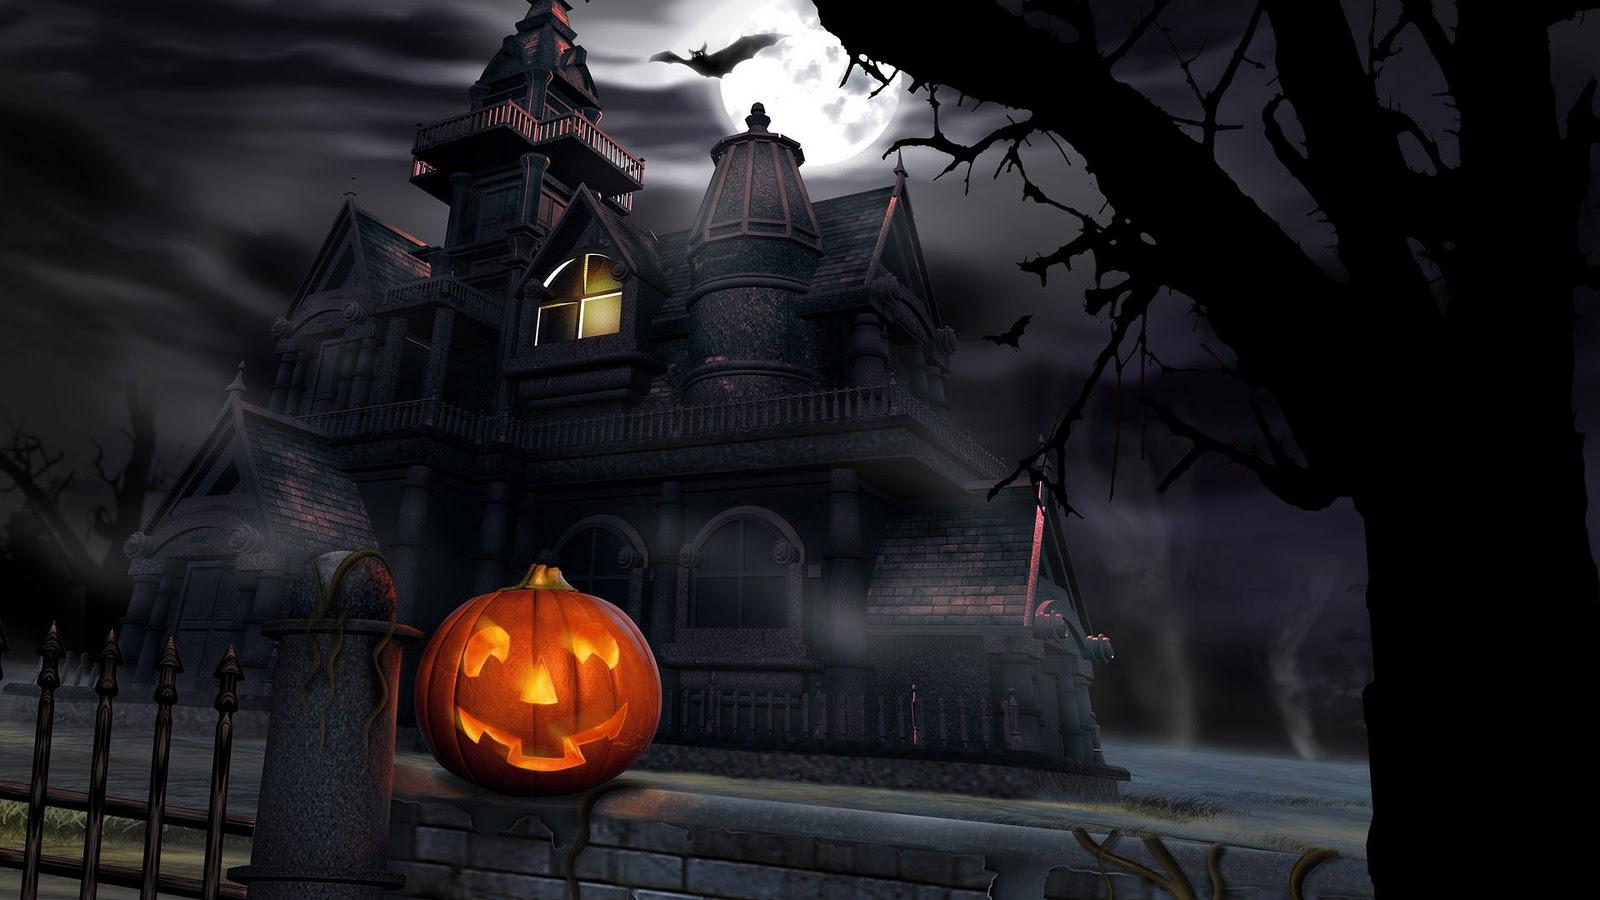 halloween screen wallpaper hd - photo #2